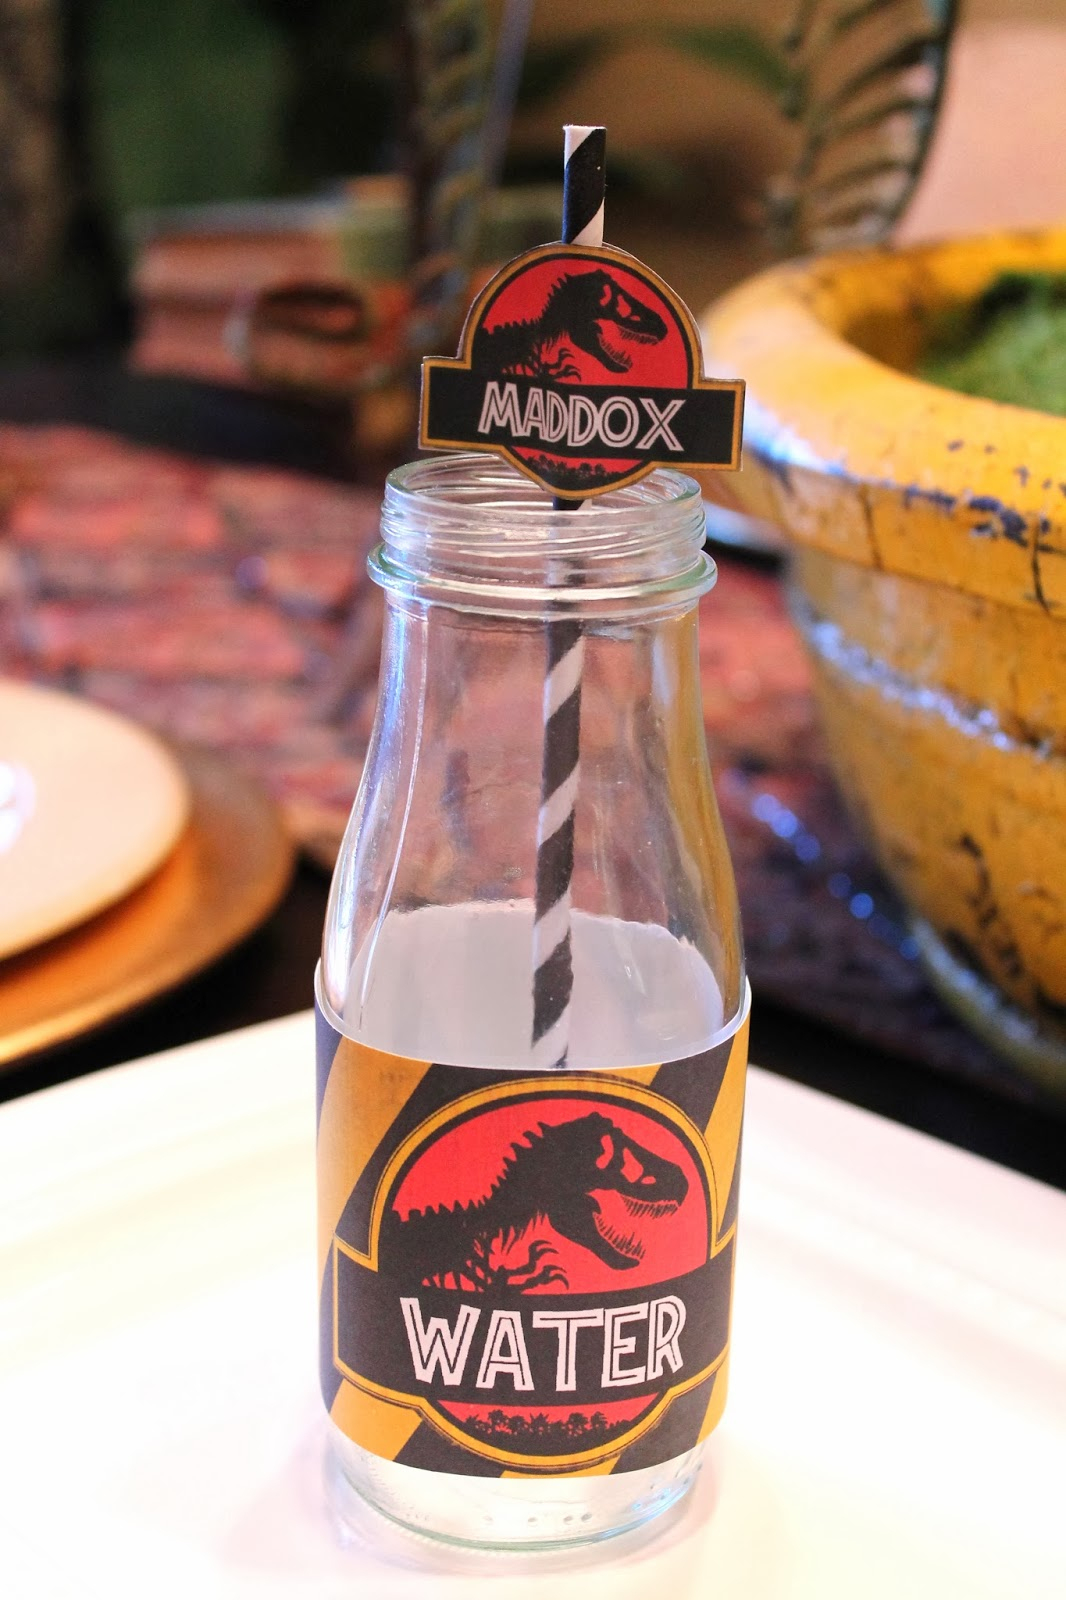 Free Dinosaur (Jurrasic Park) Party Printables - Free Printable Jurassic Park Invitations